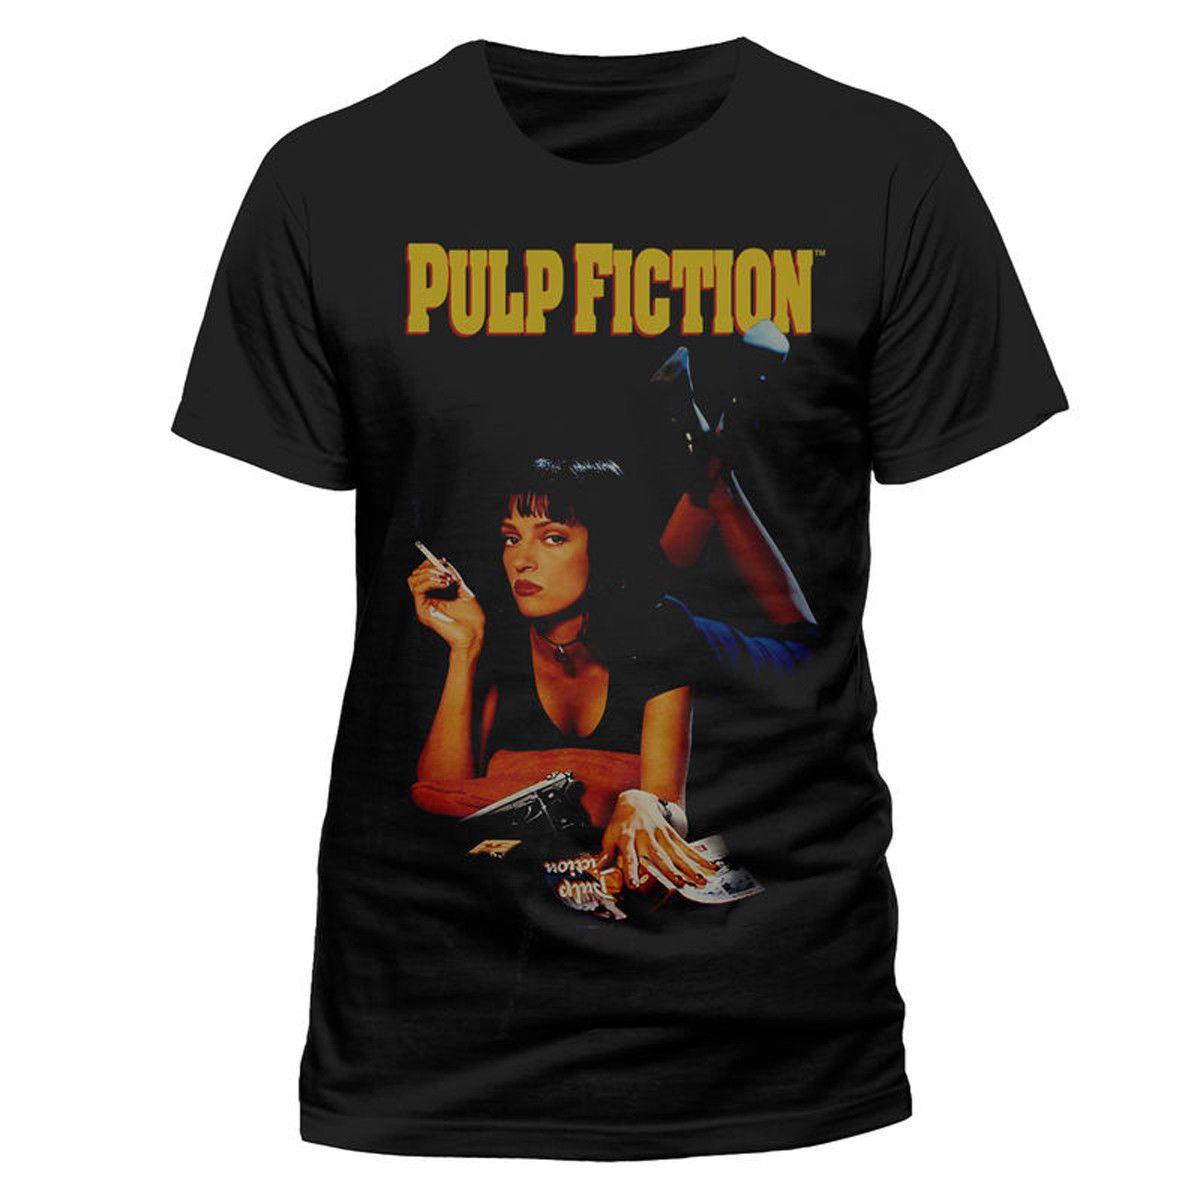 adf84f4e8 Pulp Fiction Mia Wallace Uma Thurman Official Tee T Shirt Mens Unisex Print Shirt  Long Sleeve Tee Shirts From Nothingshirt, $13.19| DHgate.Com